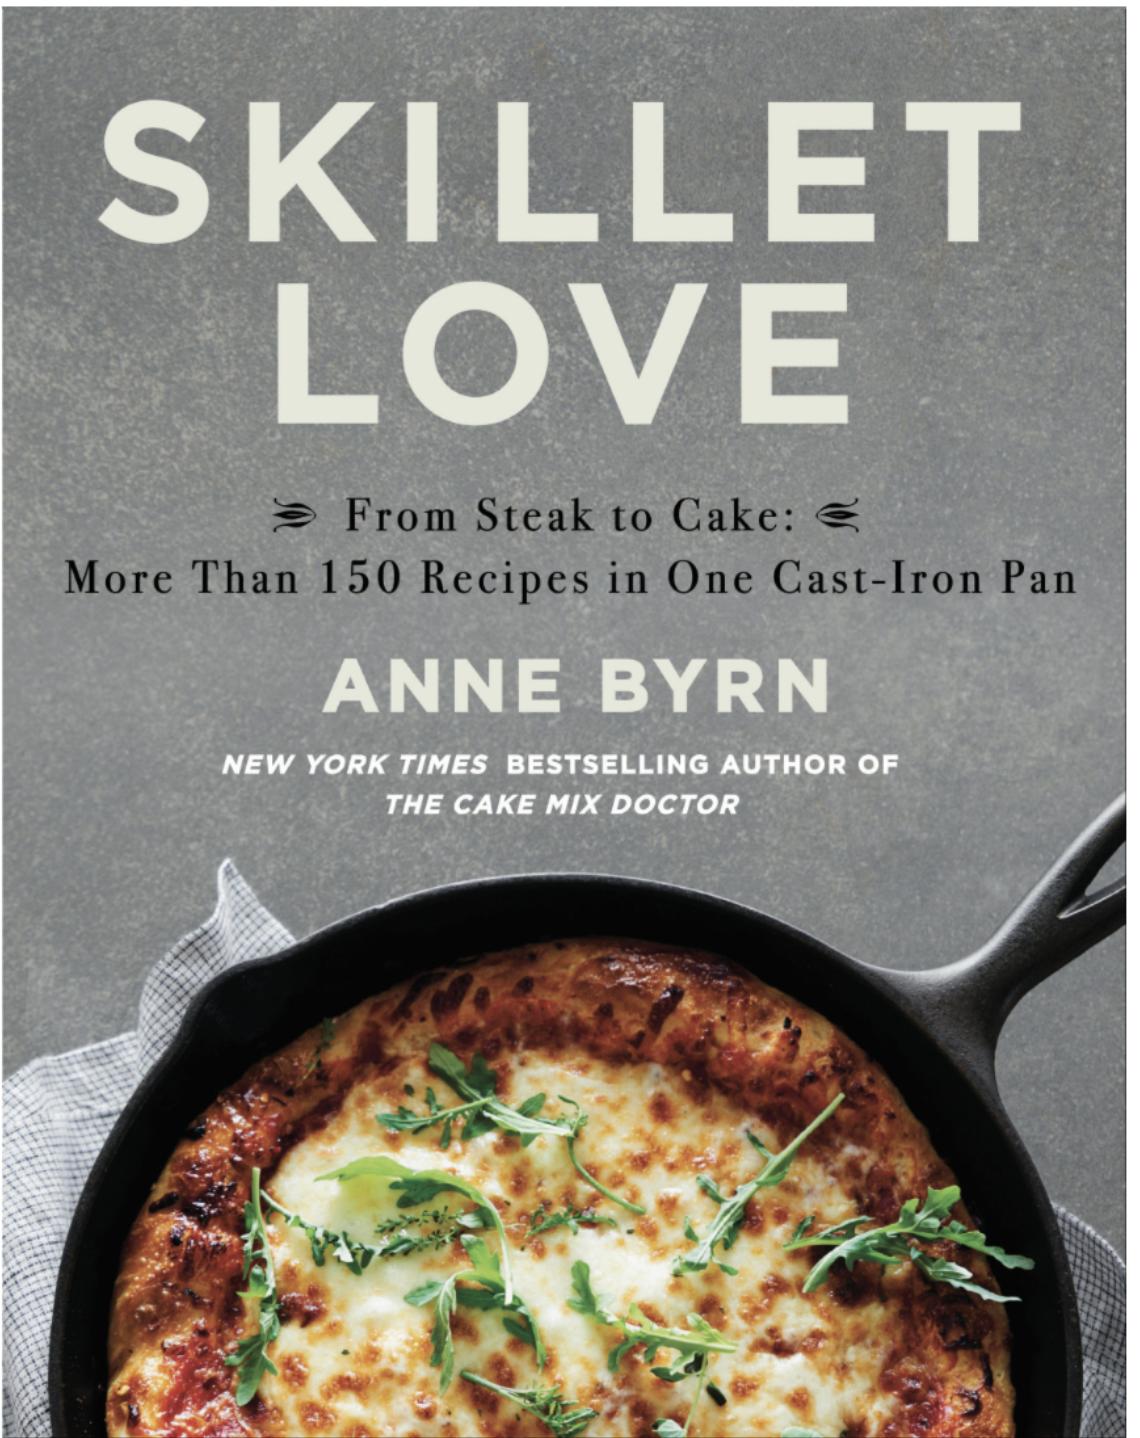 Skillet Love, Author Anne Byrn